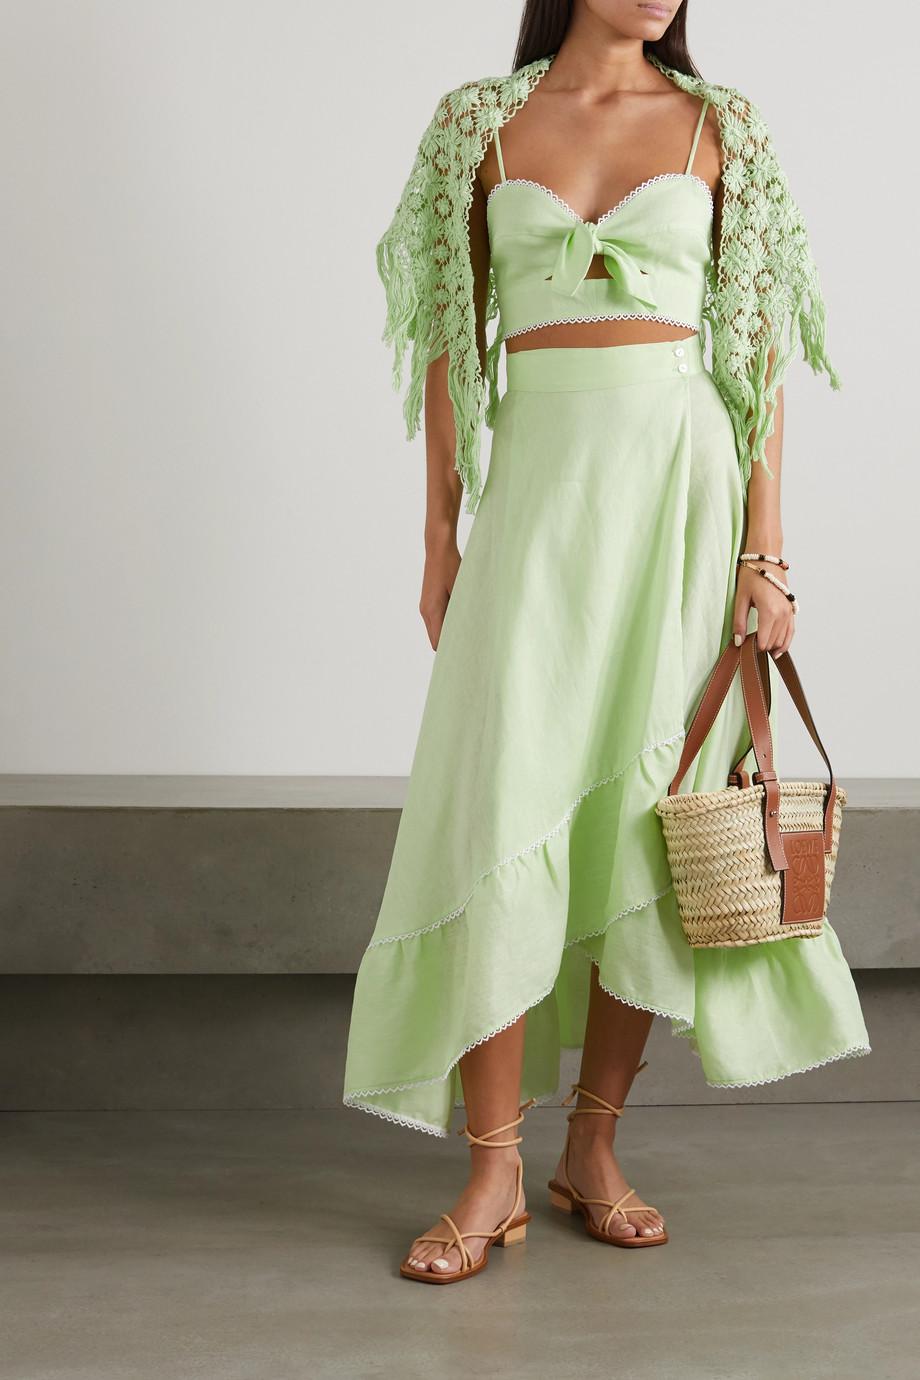 Miguelina Kiana fringed crocheted cotton shawl